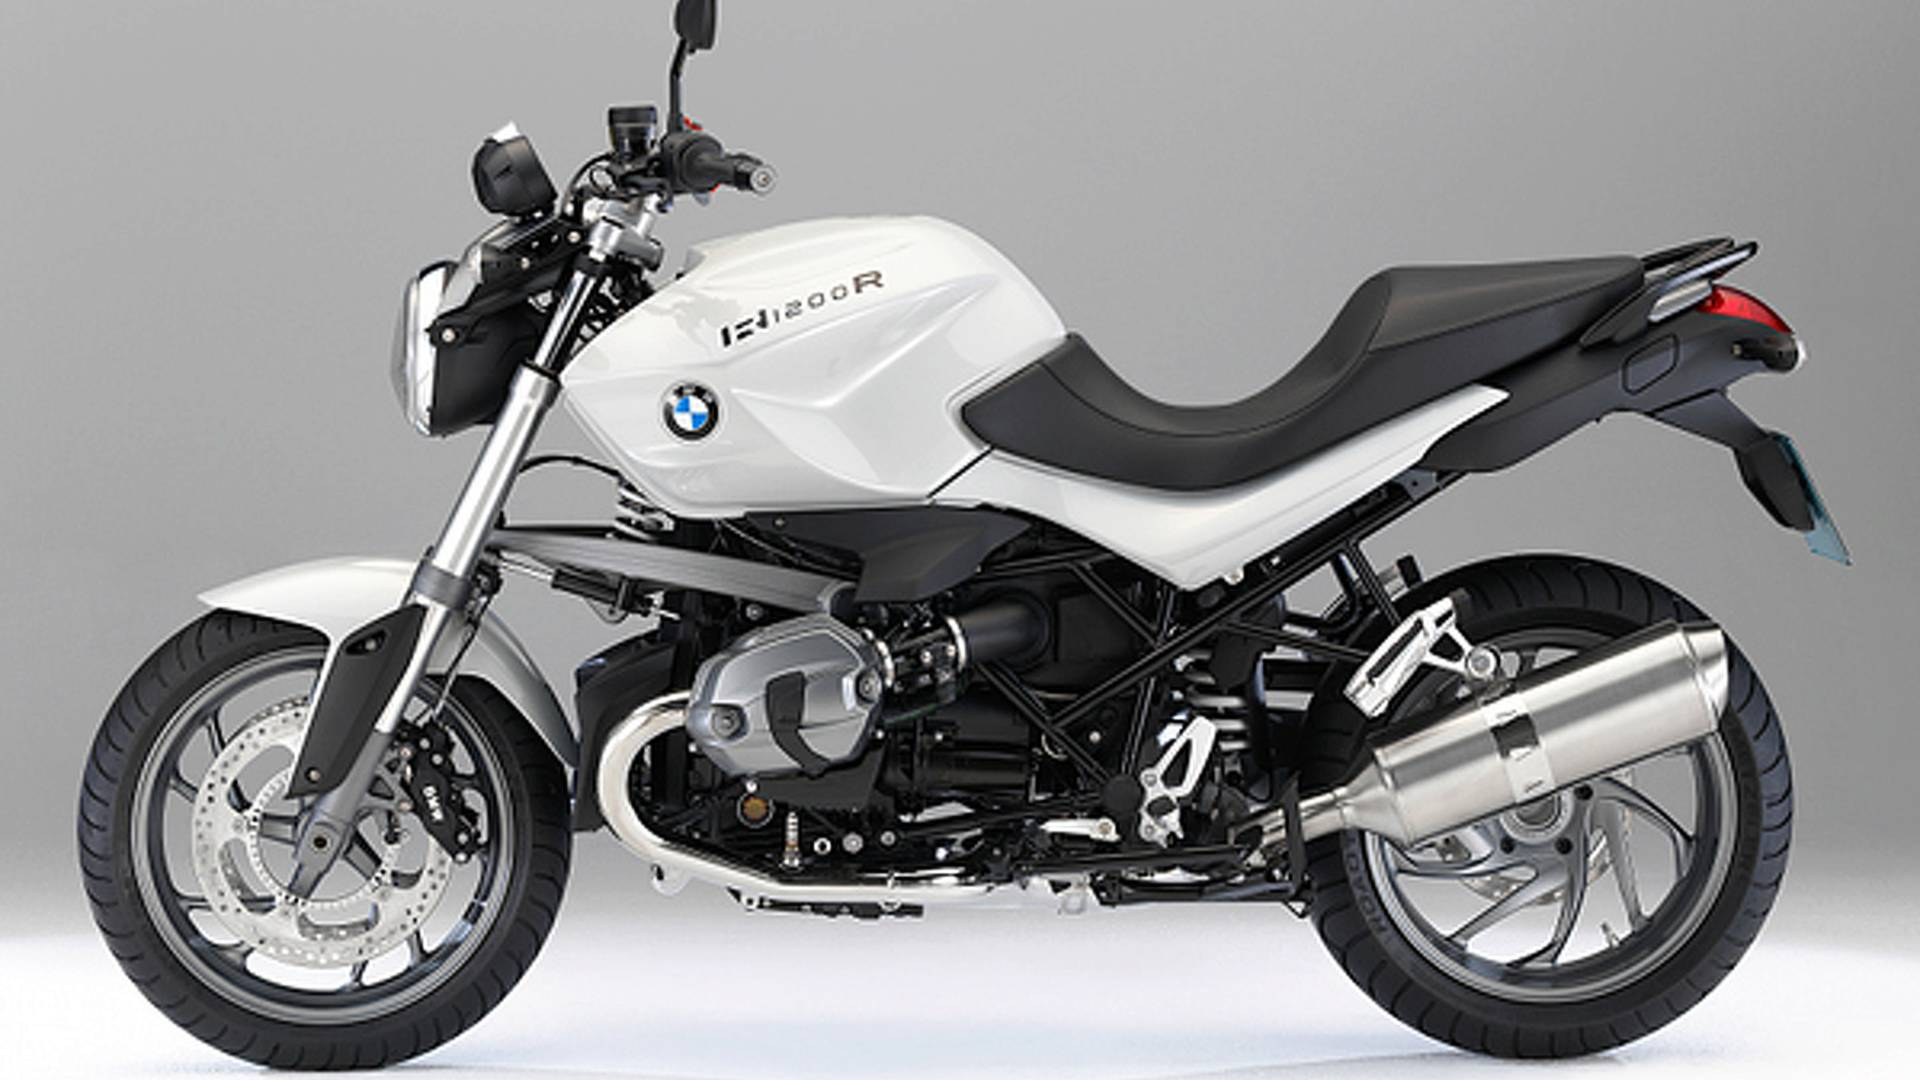 2011 BMW R1200R and R1200R Classic: DOHC engine, sharper looks